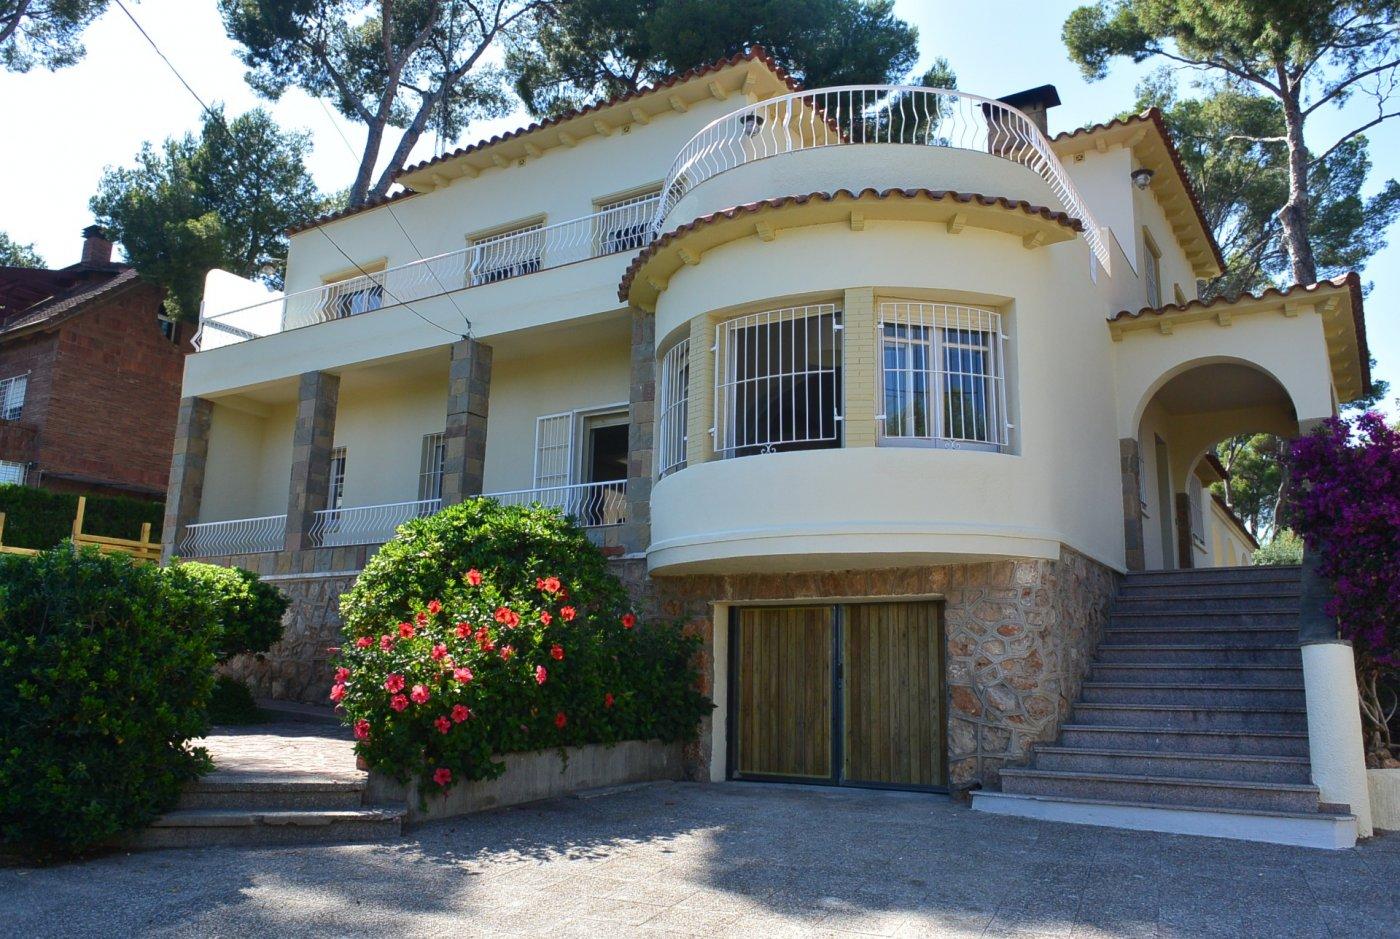 casa en castelldefels · montemar-bajo 0€